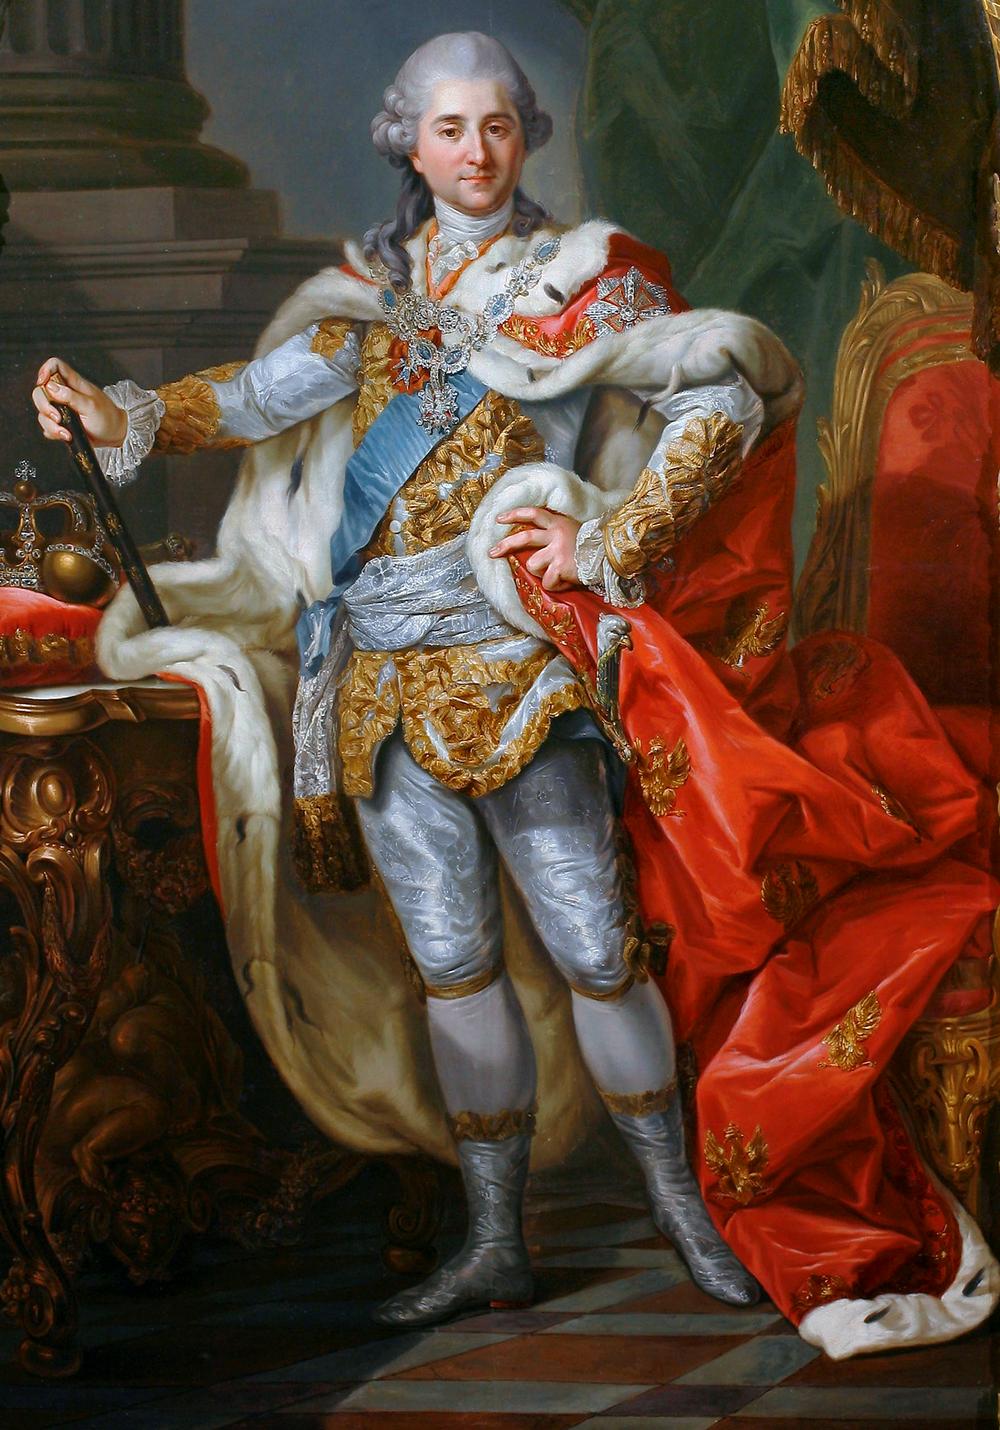 Stanislas Augustus Poniatowski, King of Poland